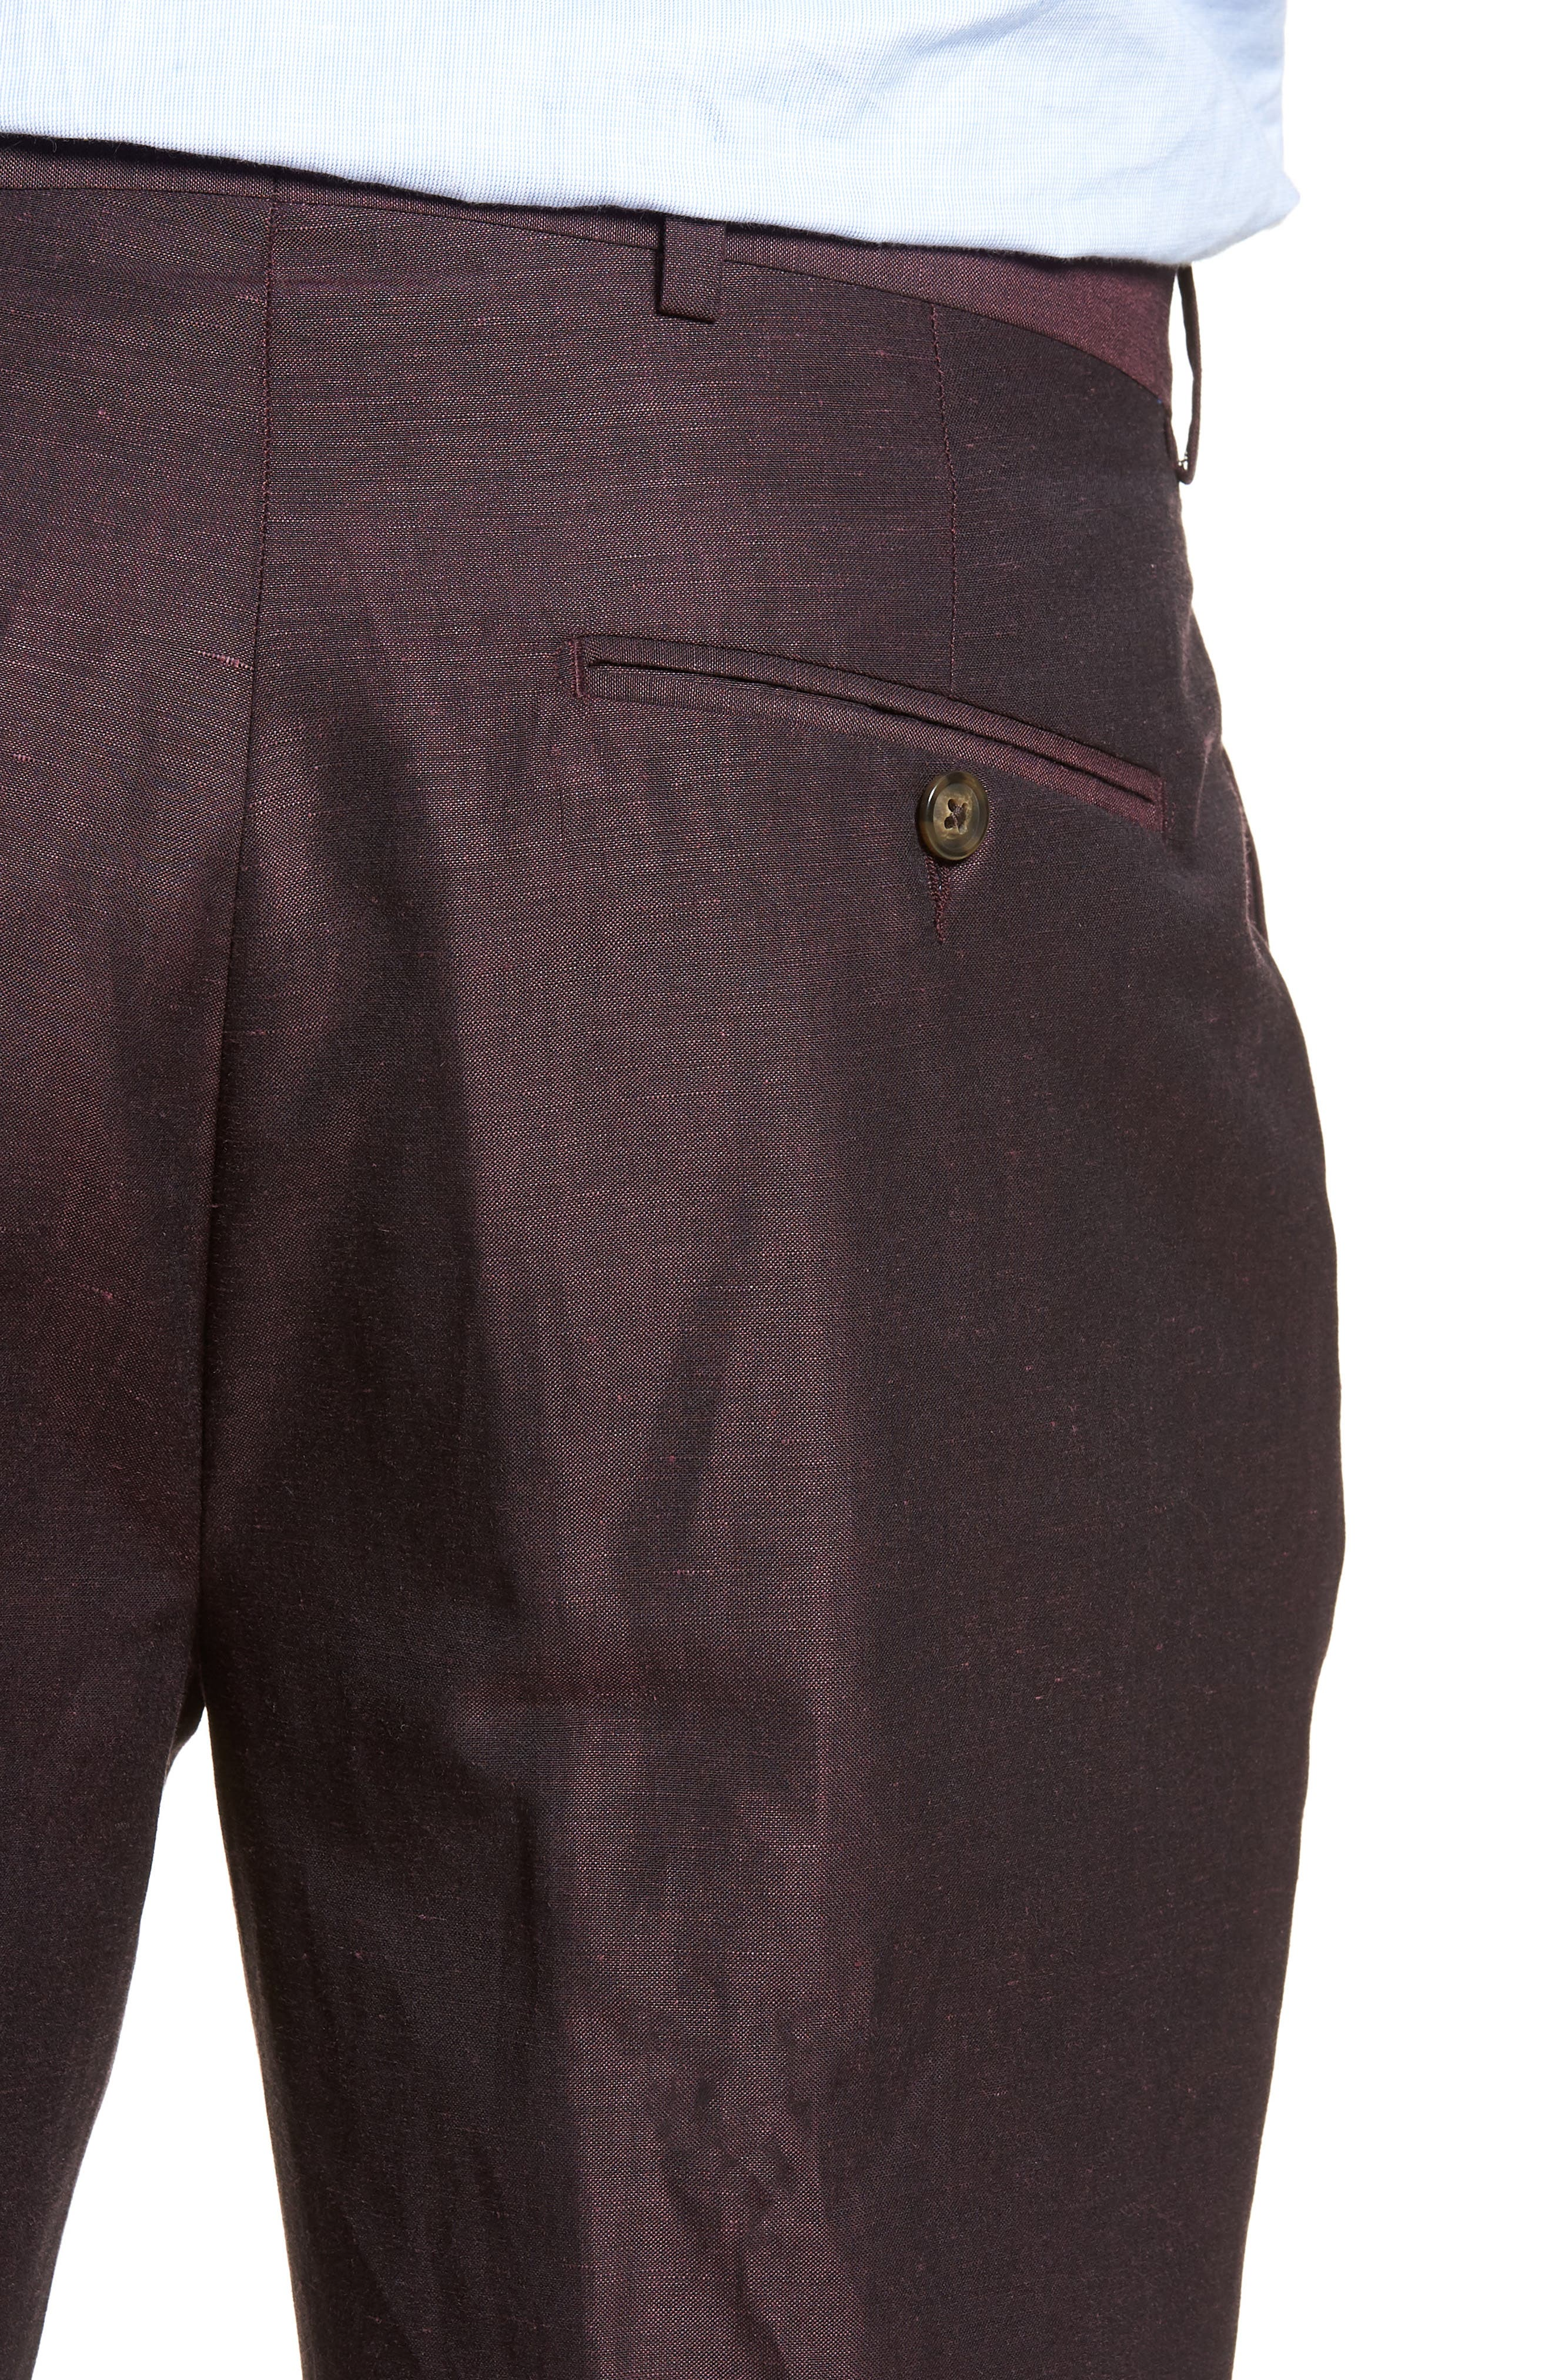 Dagger Flat Front Solid Wool & Linen Trousers,                             Alternate thumbnail 4, color,                             Plum